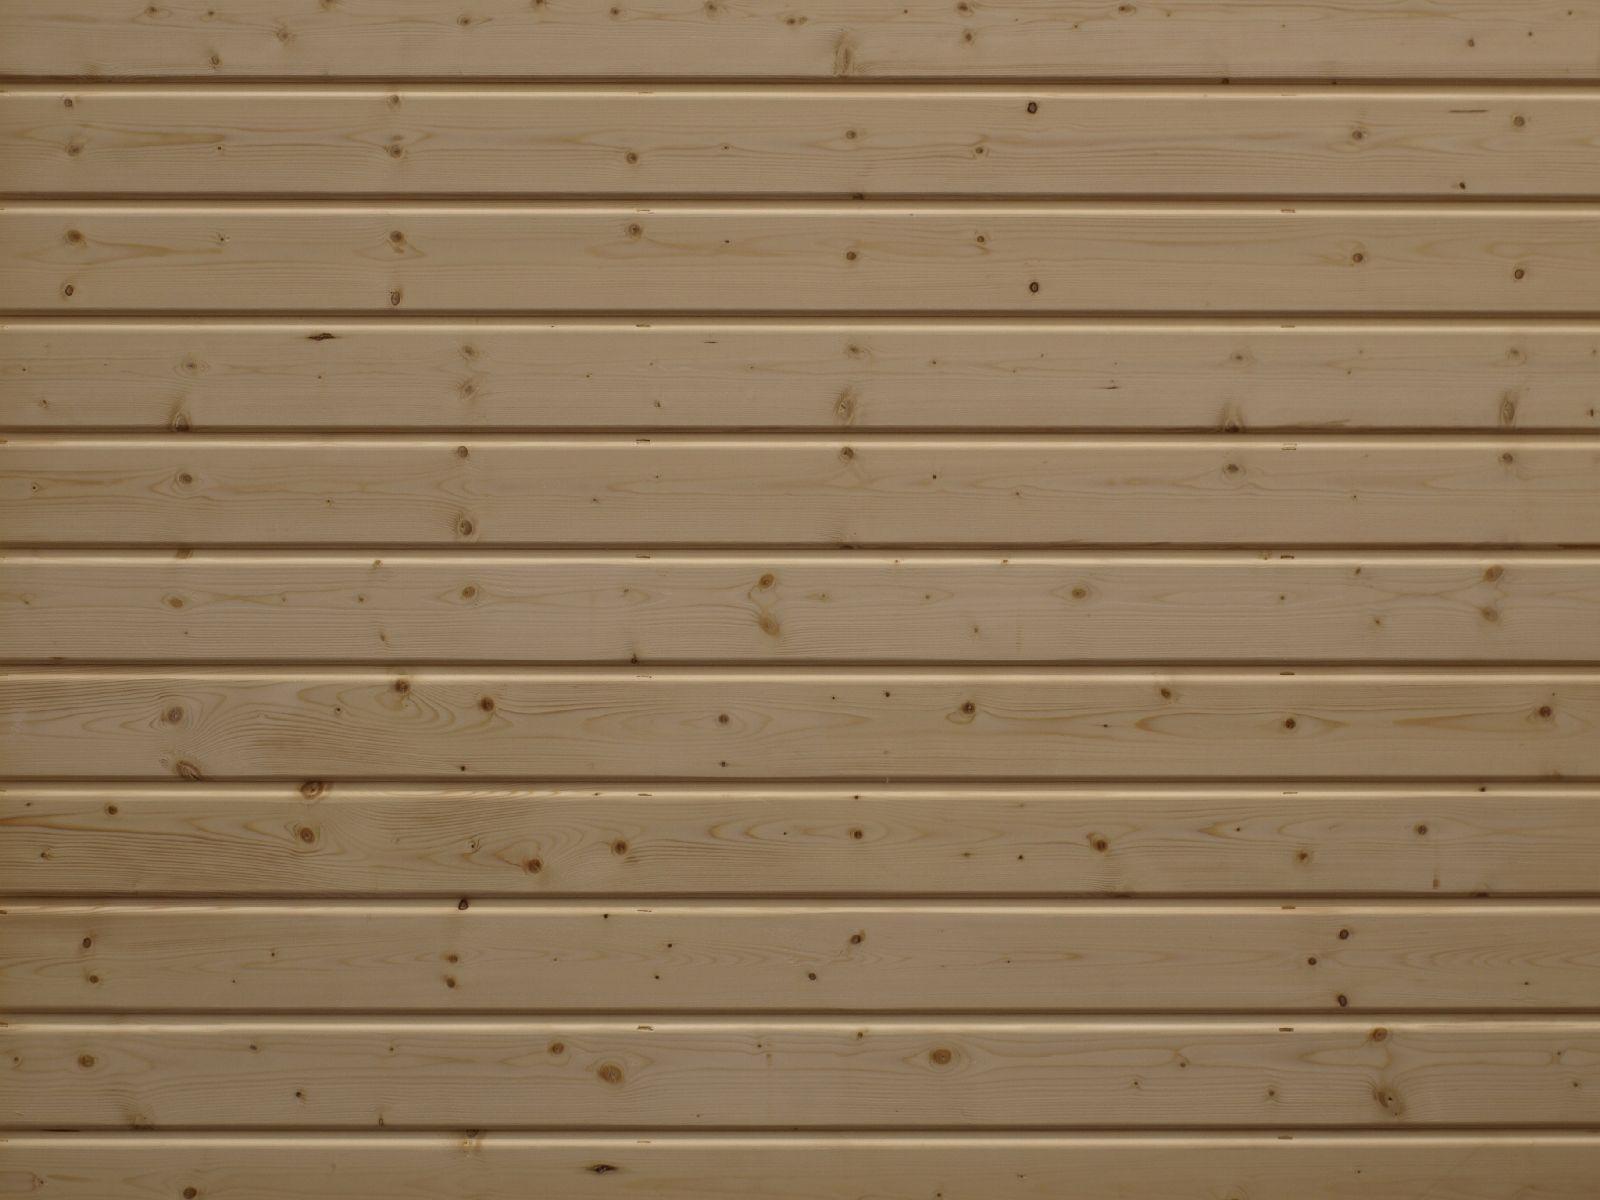 Wood_Texture_A_PB090988